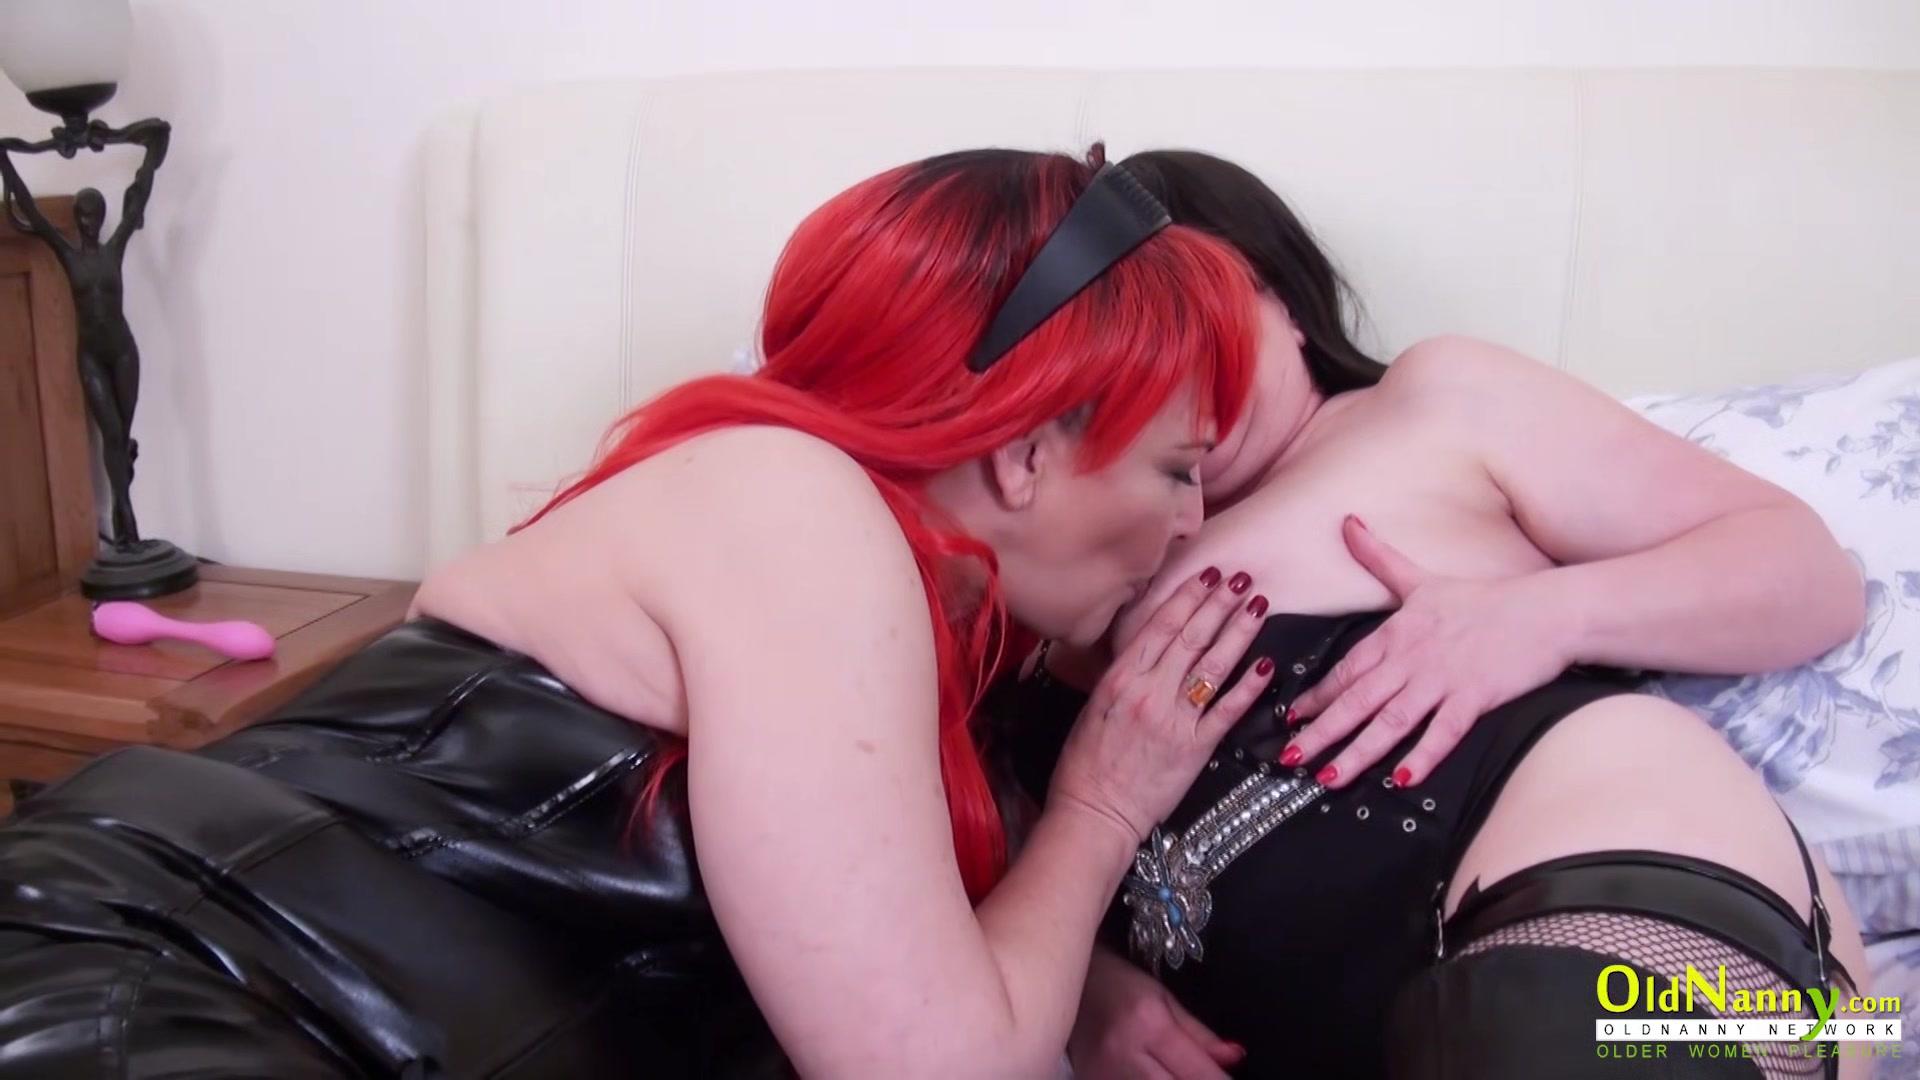 Mature Lesbians Masturbating With Toys